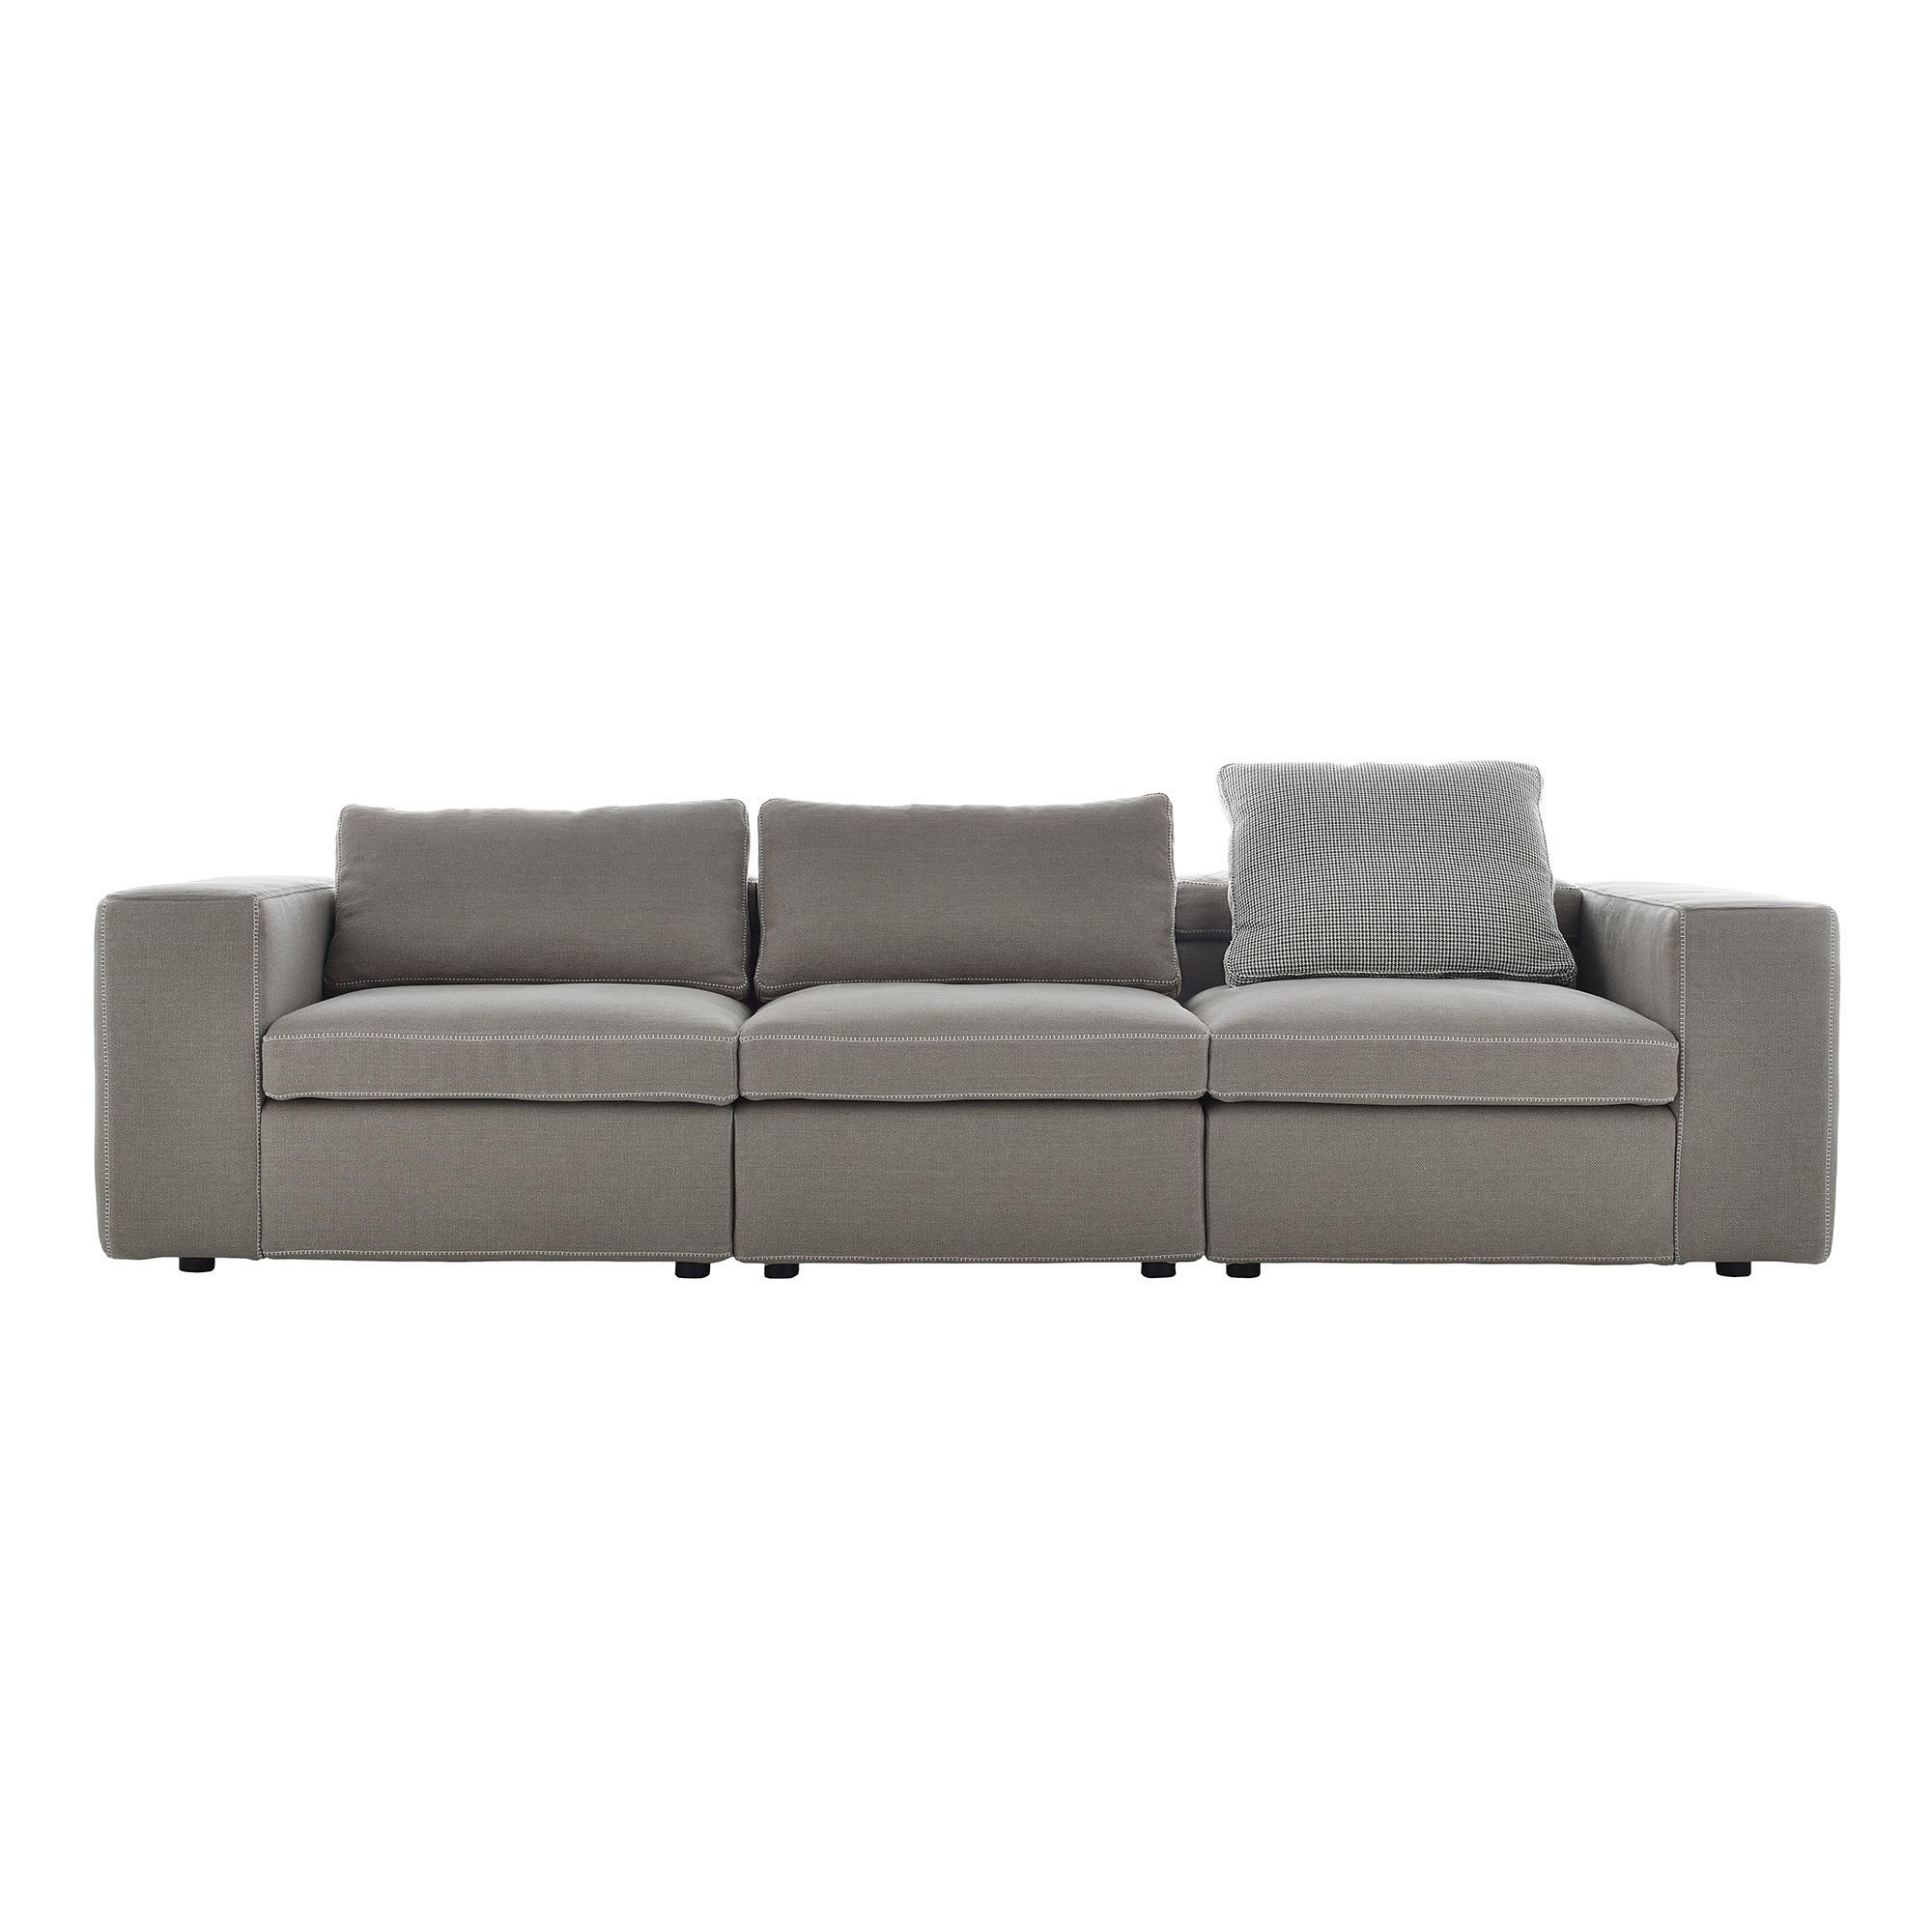 Full Size of Natura Sofa Gebraucht Couch Kansas Pasadena Kaufen Brooklyn Denver Home Newport Xxxl Mit Hocker Erpo Garten Ecksofa Groß Schlaffunktion Federkern Led Sofa Natura Sofa